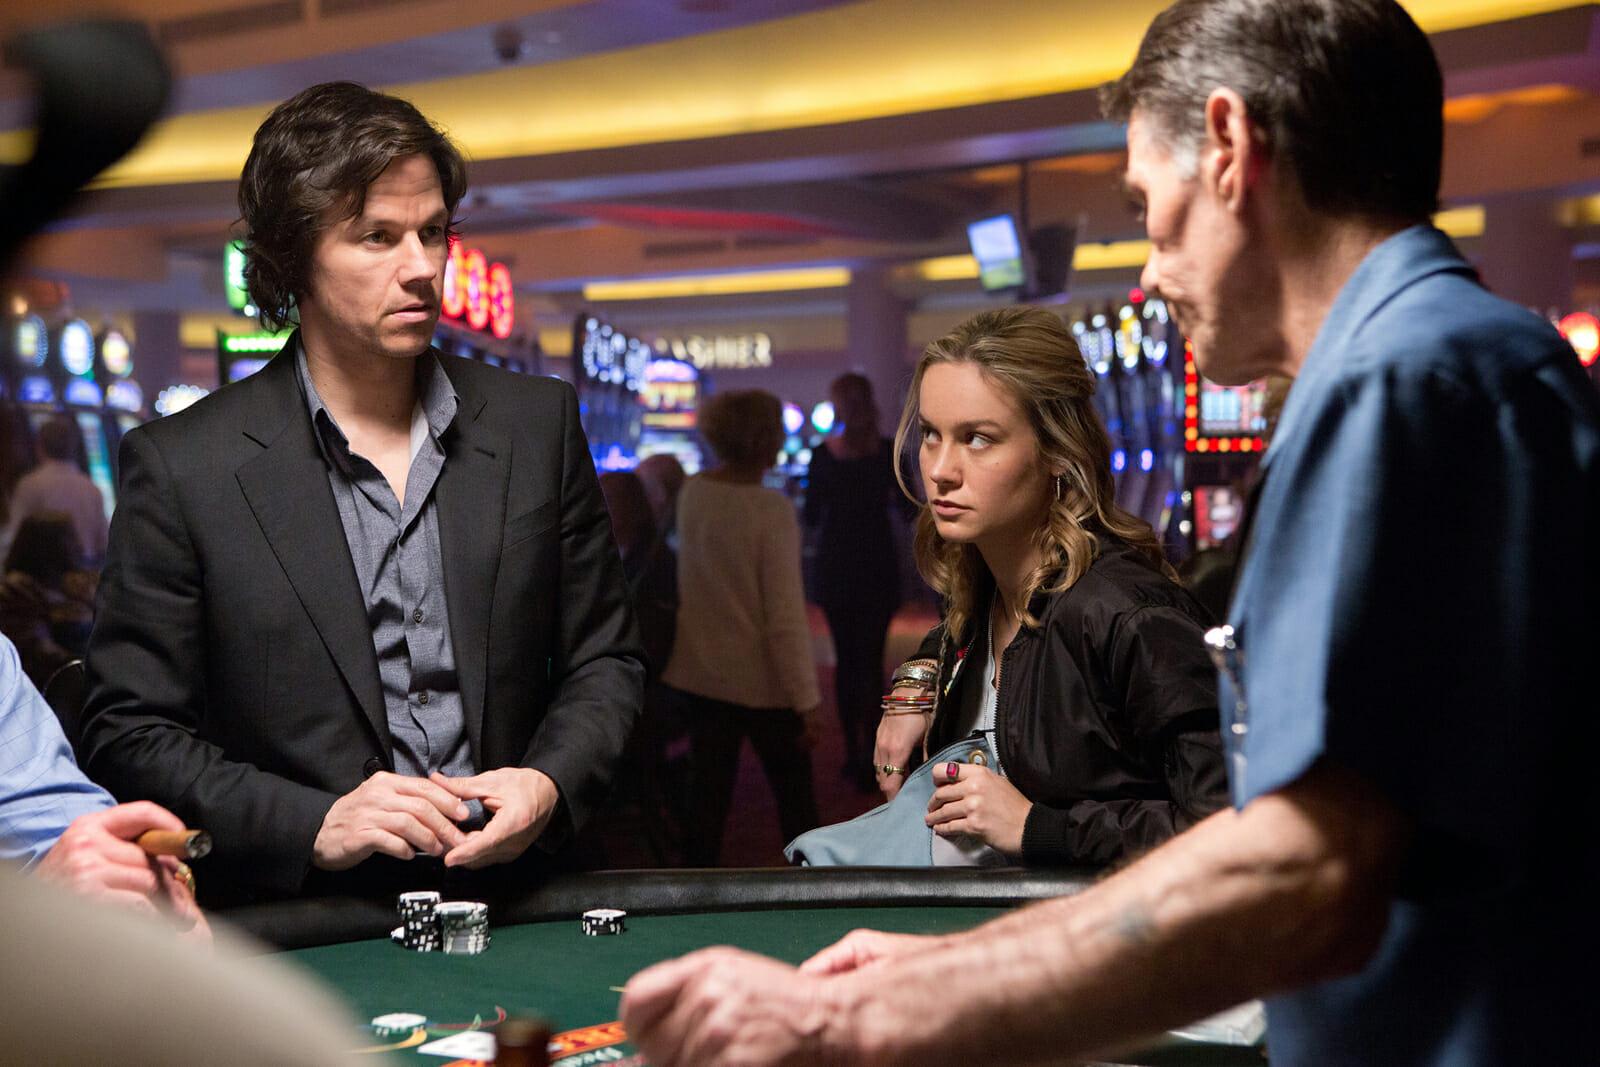 The-Gambler-Mark-Wahlberg-Brie-Larson